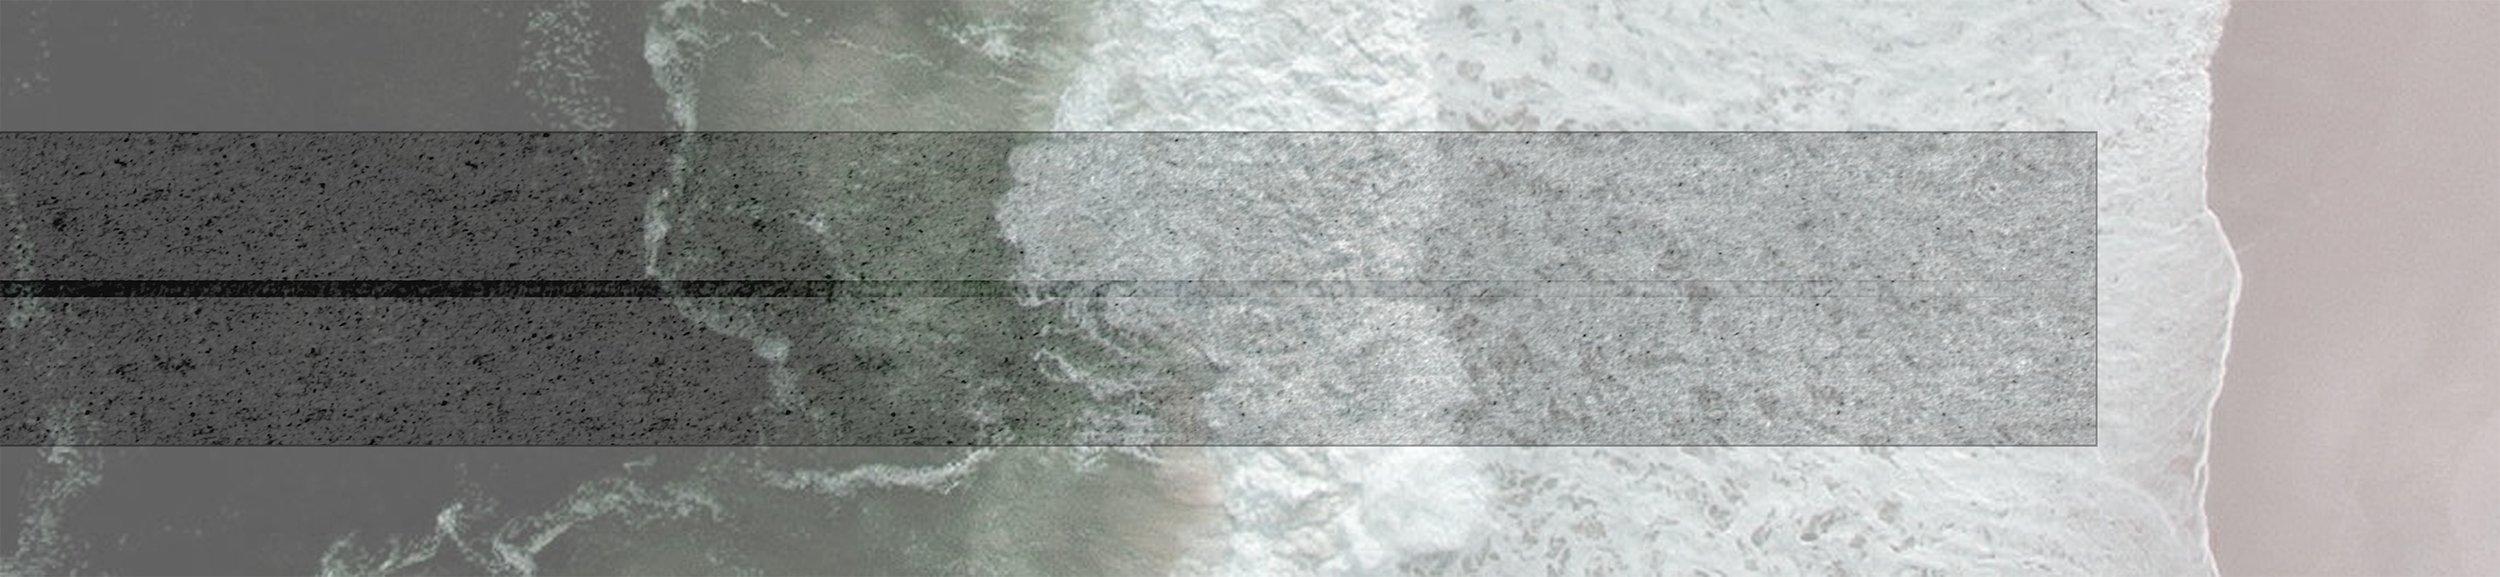 Cover+Image.jpg